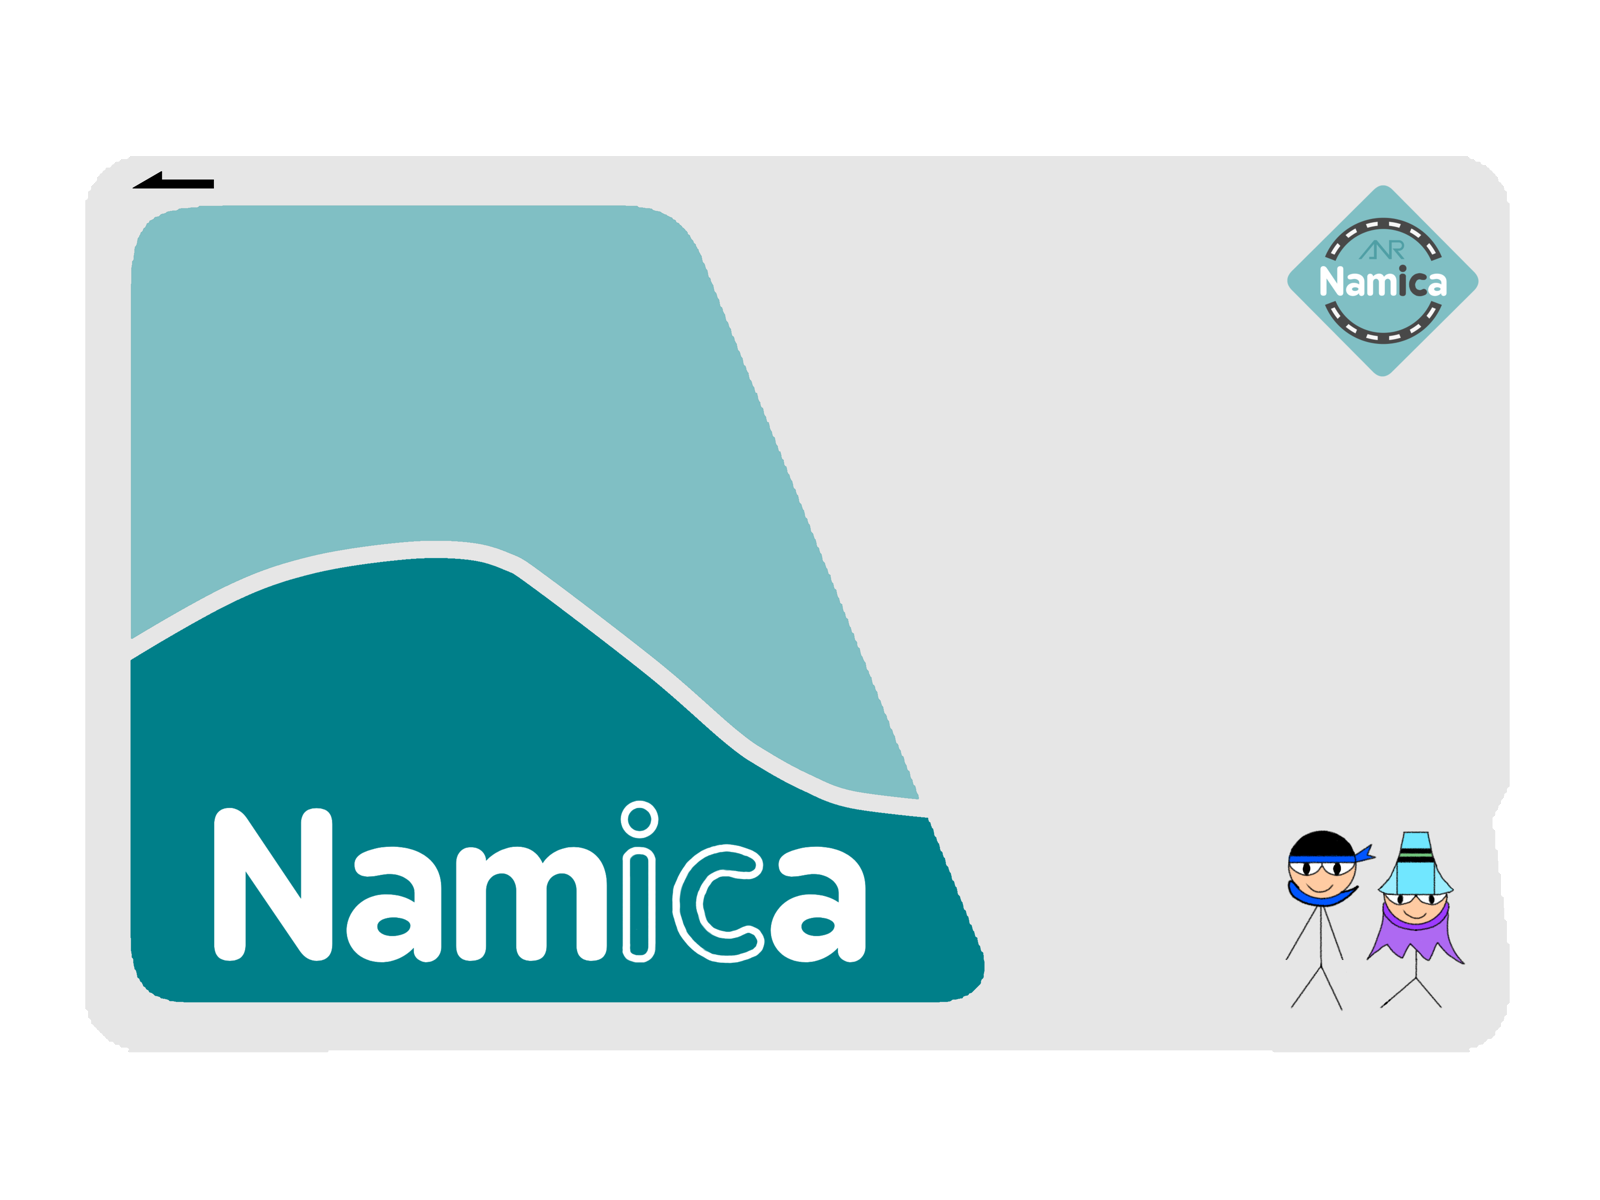 Namica-01.png